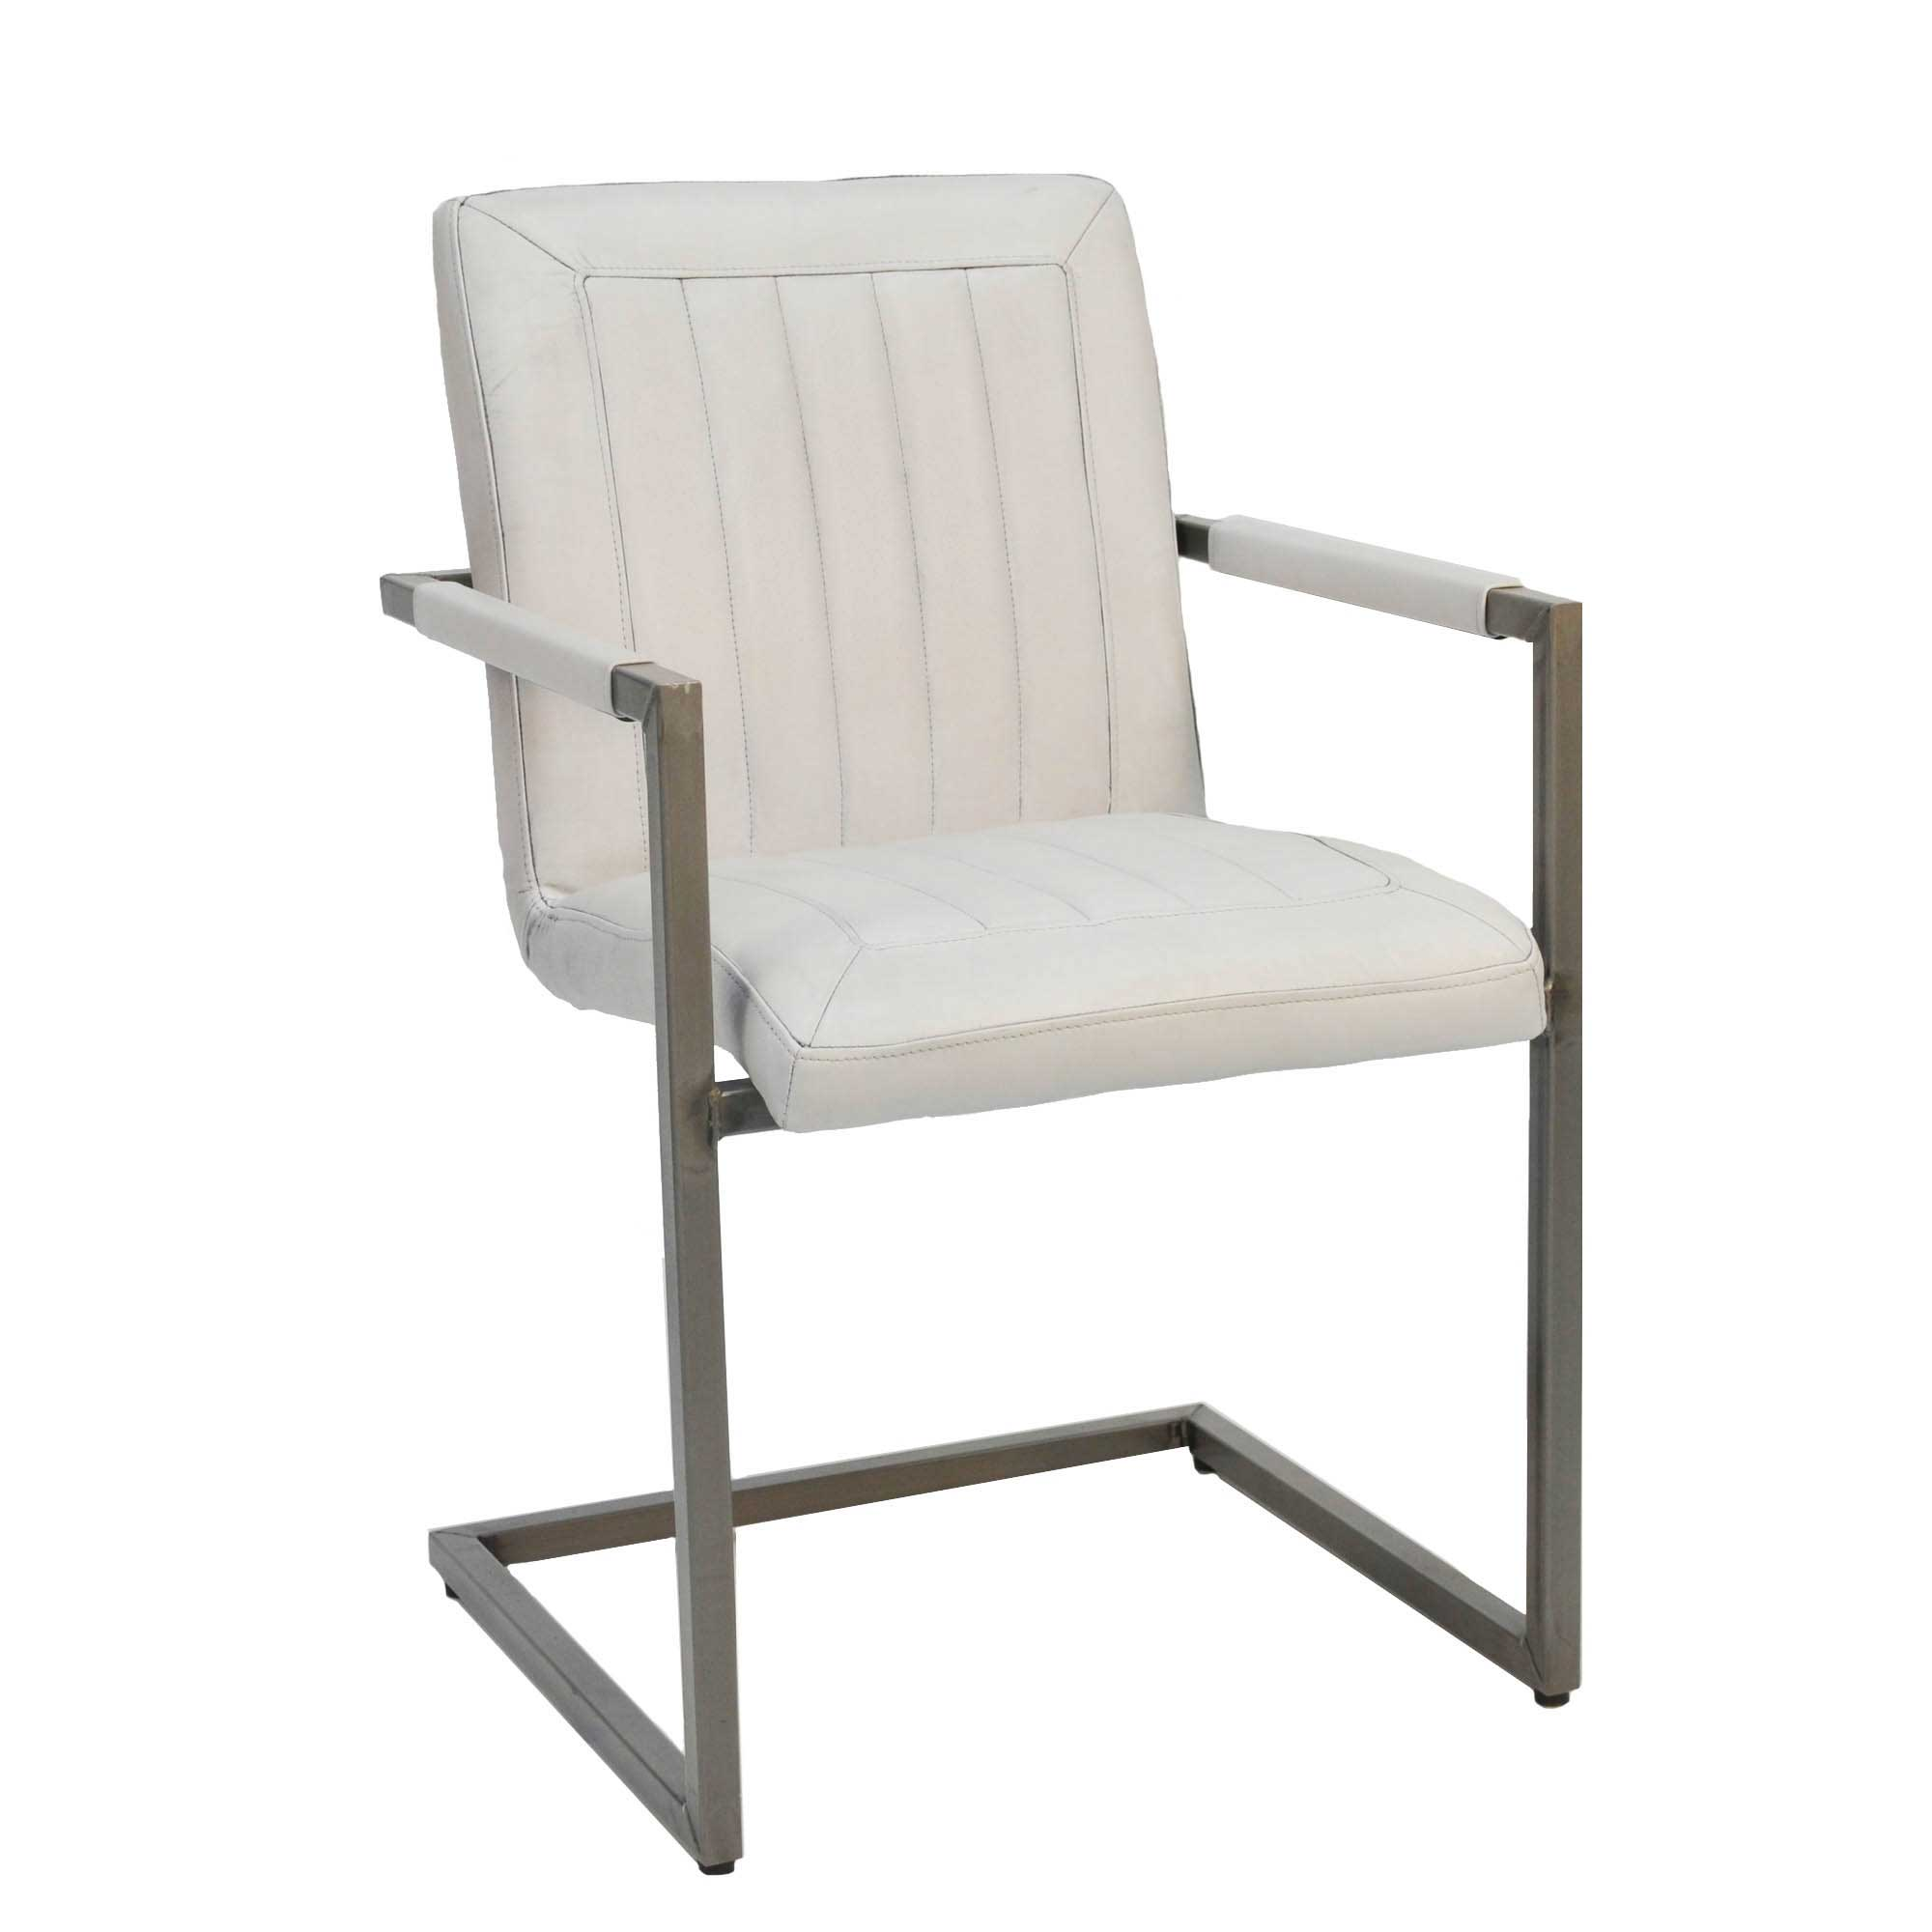 freischwinger st hle leder weiss neuesten. Black Bedroom Furniture Sets. Home Design Ideas